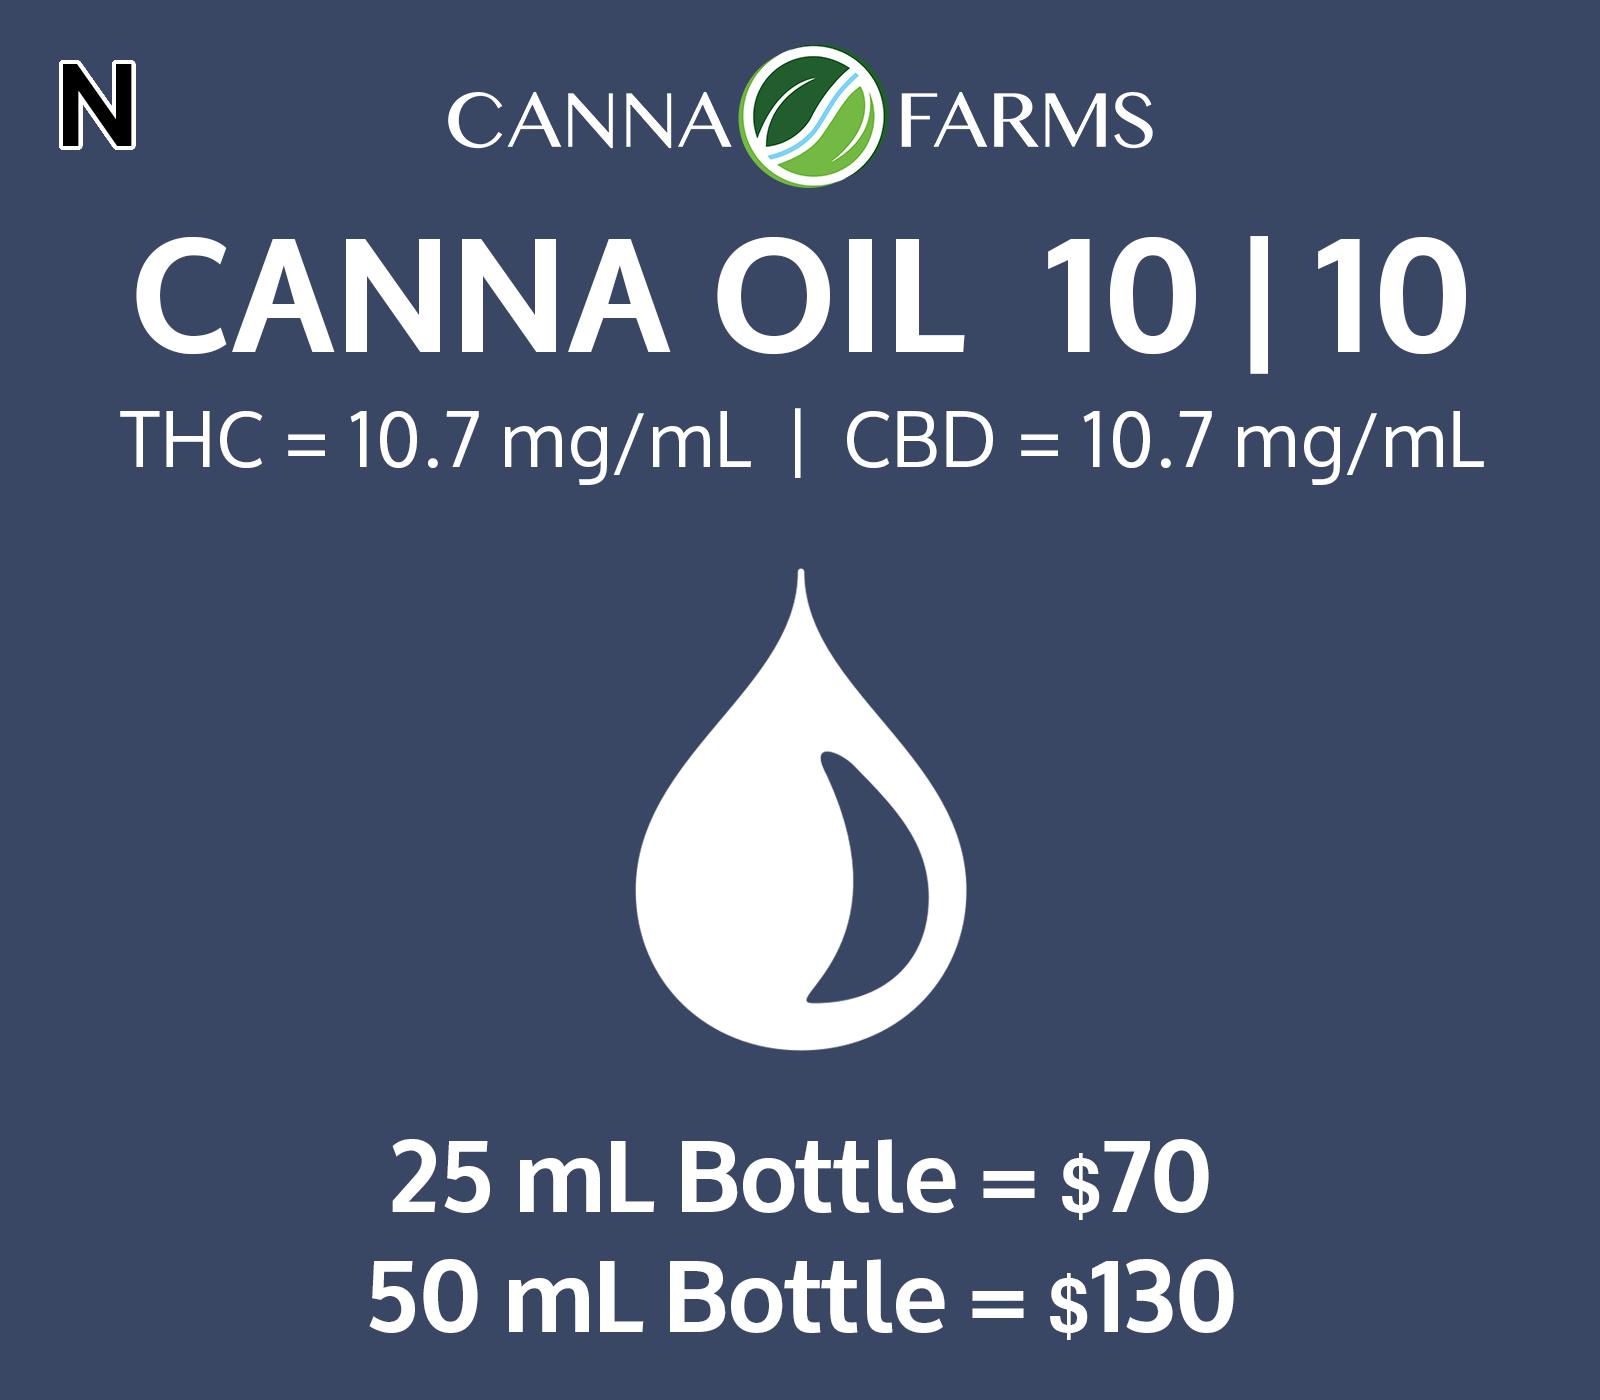 CANNA_OIL_10_10_10.7CBD.png